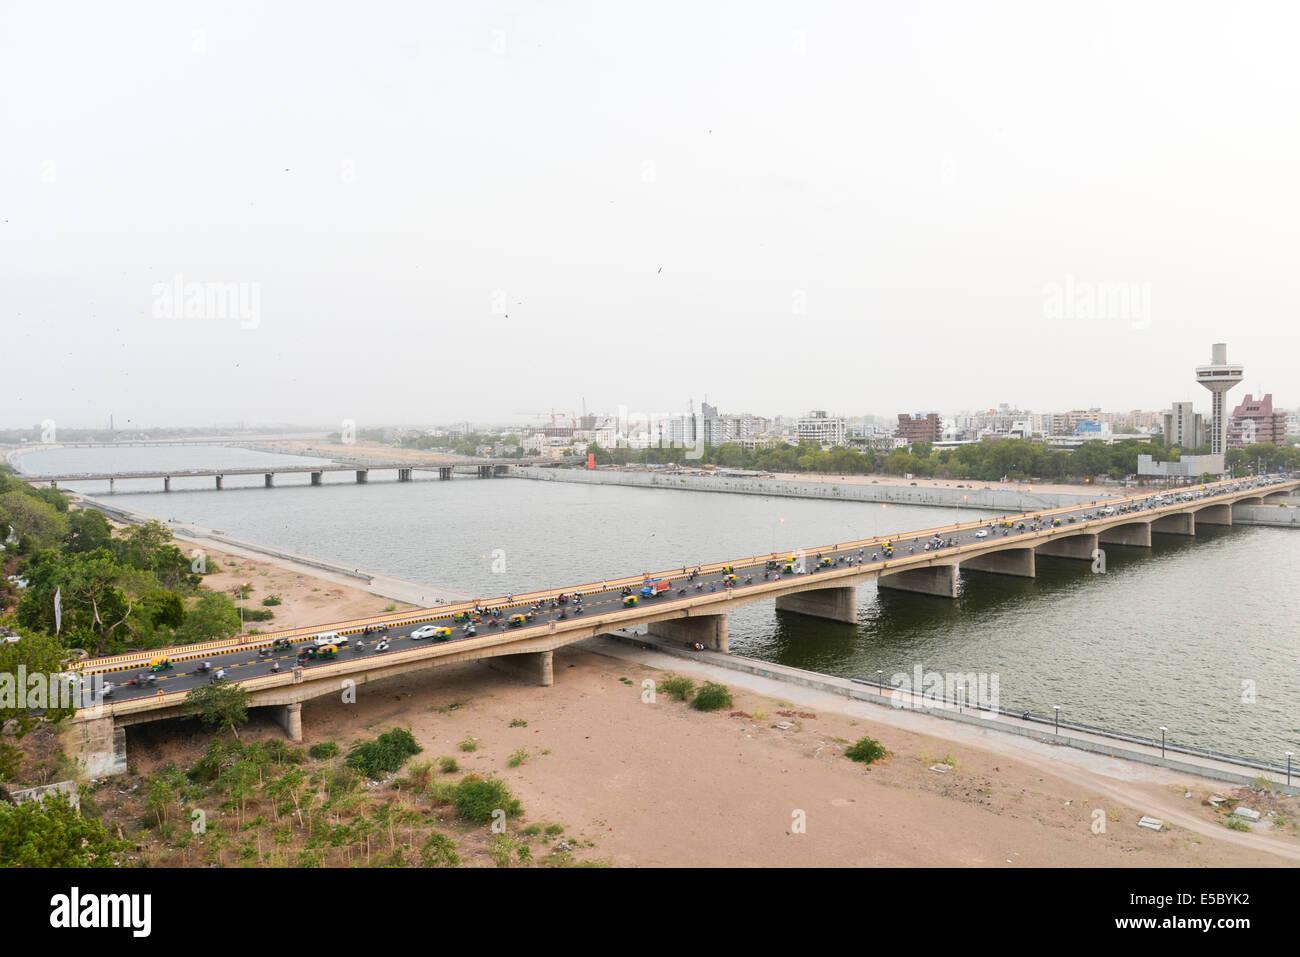 Sabarmati river front view. - Stock Image